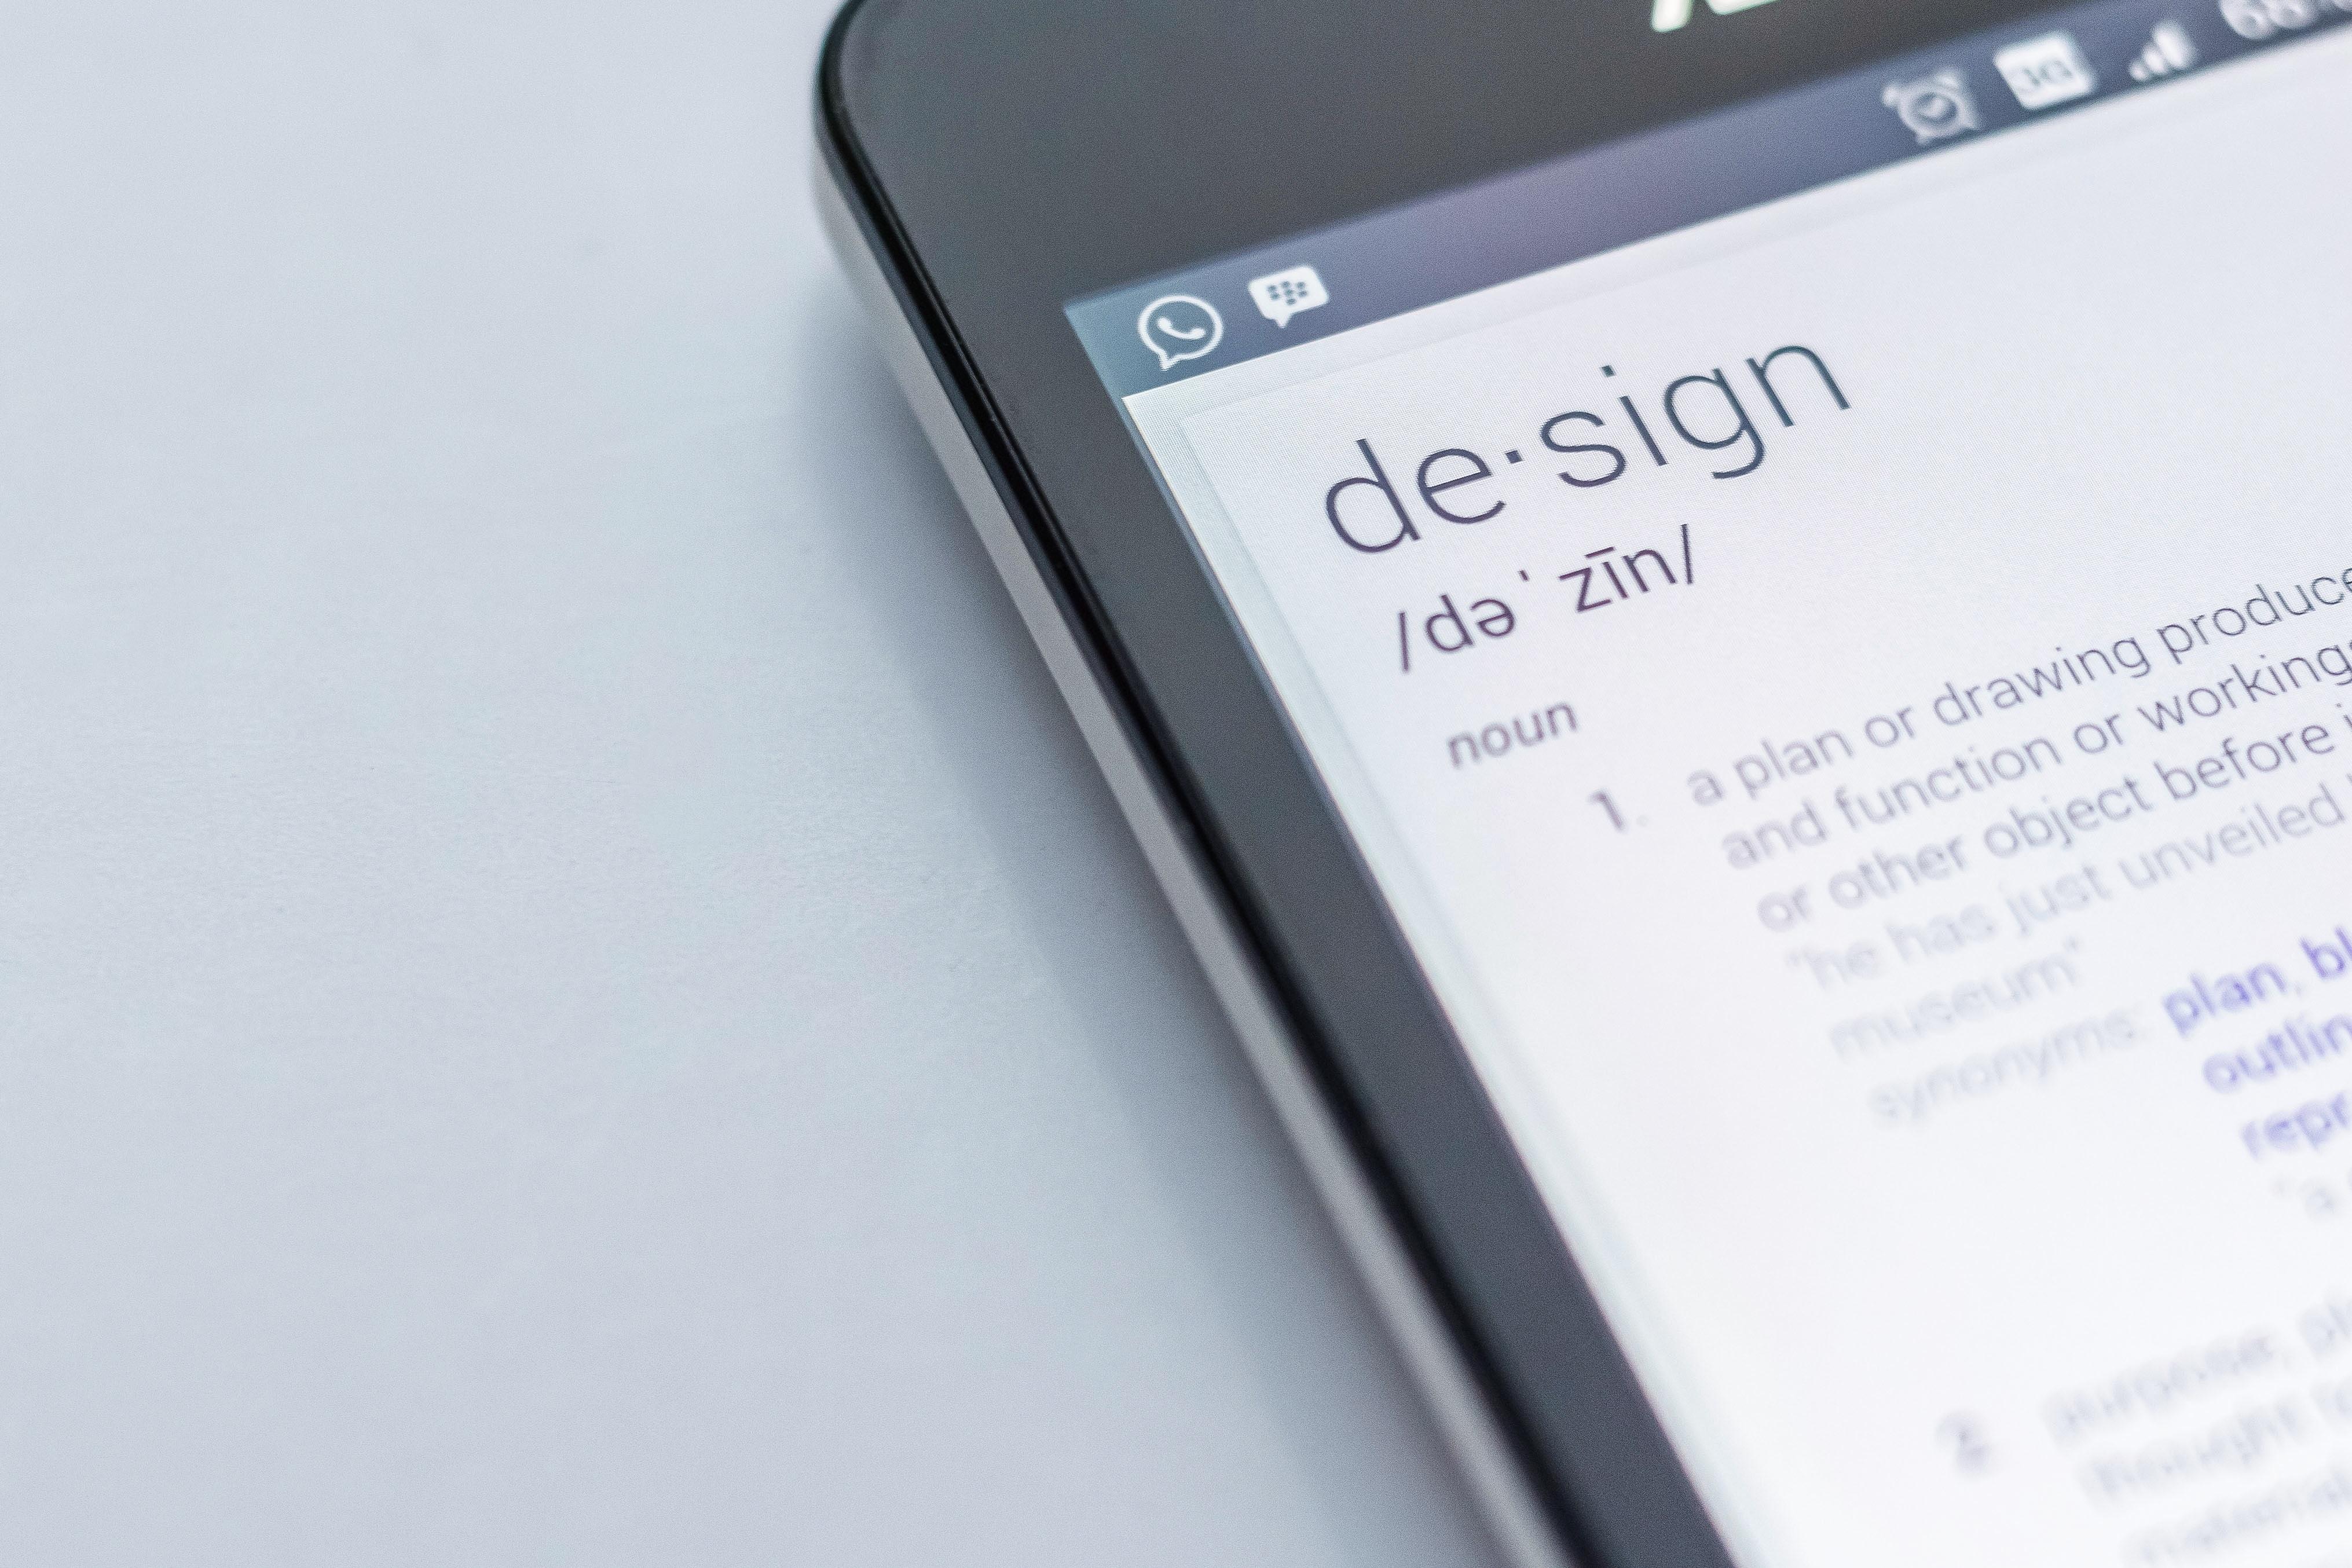 Design definition on smartphone